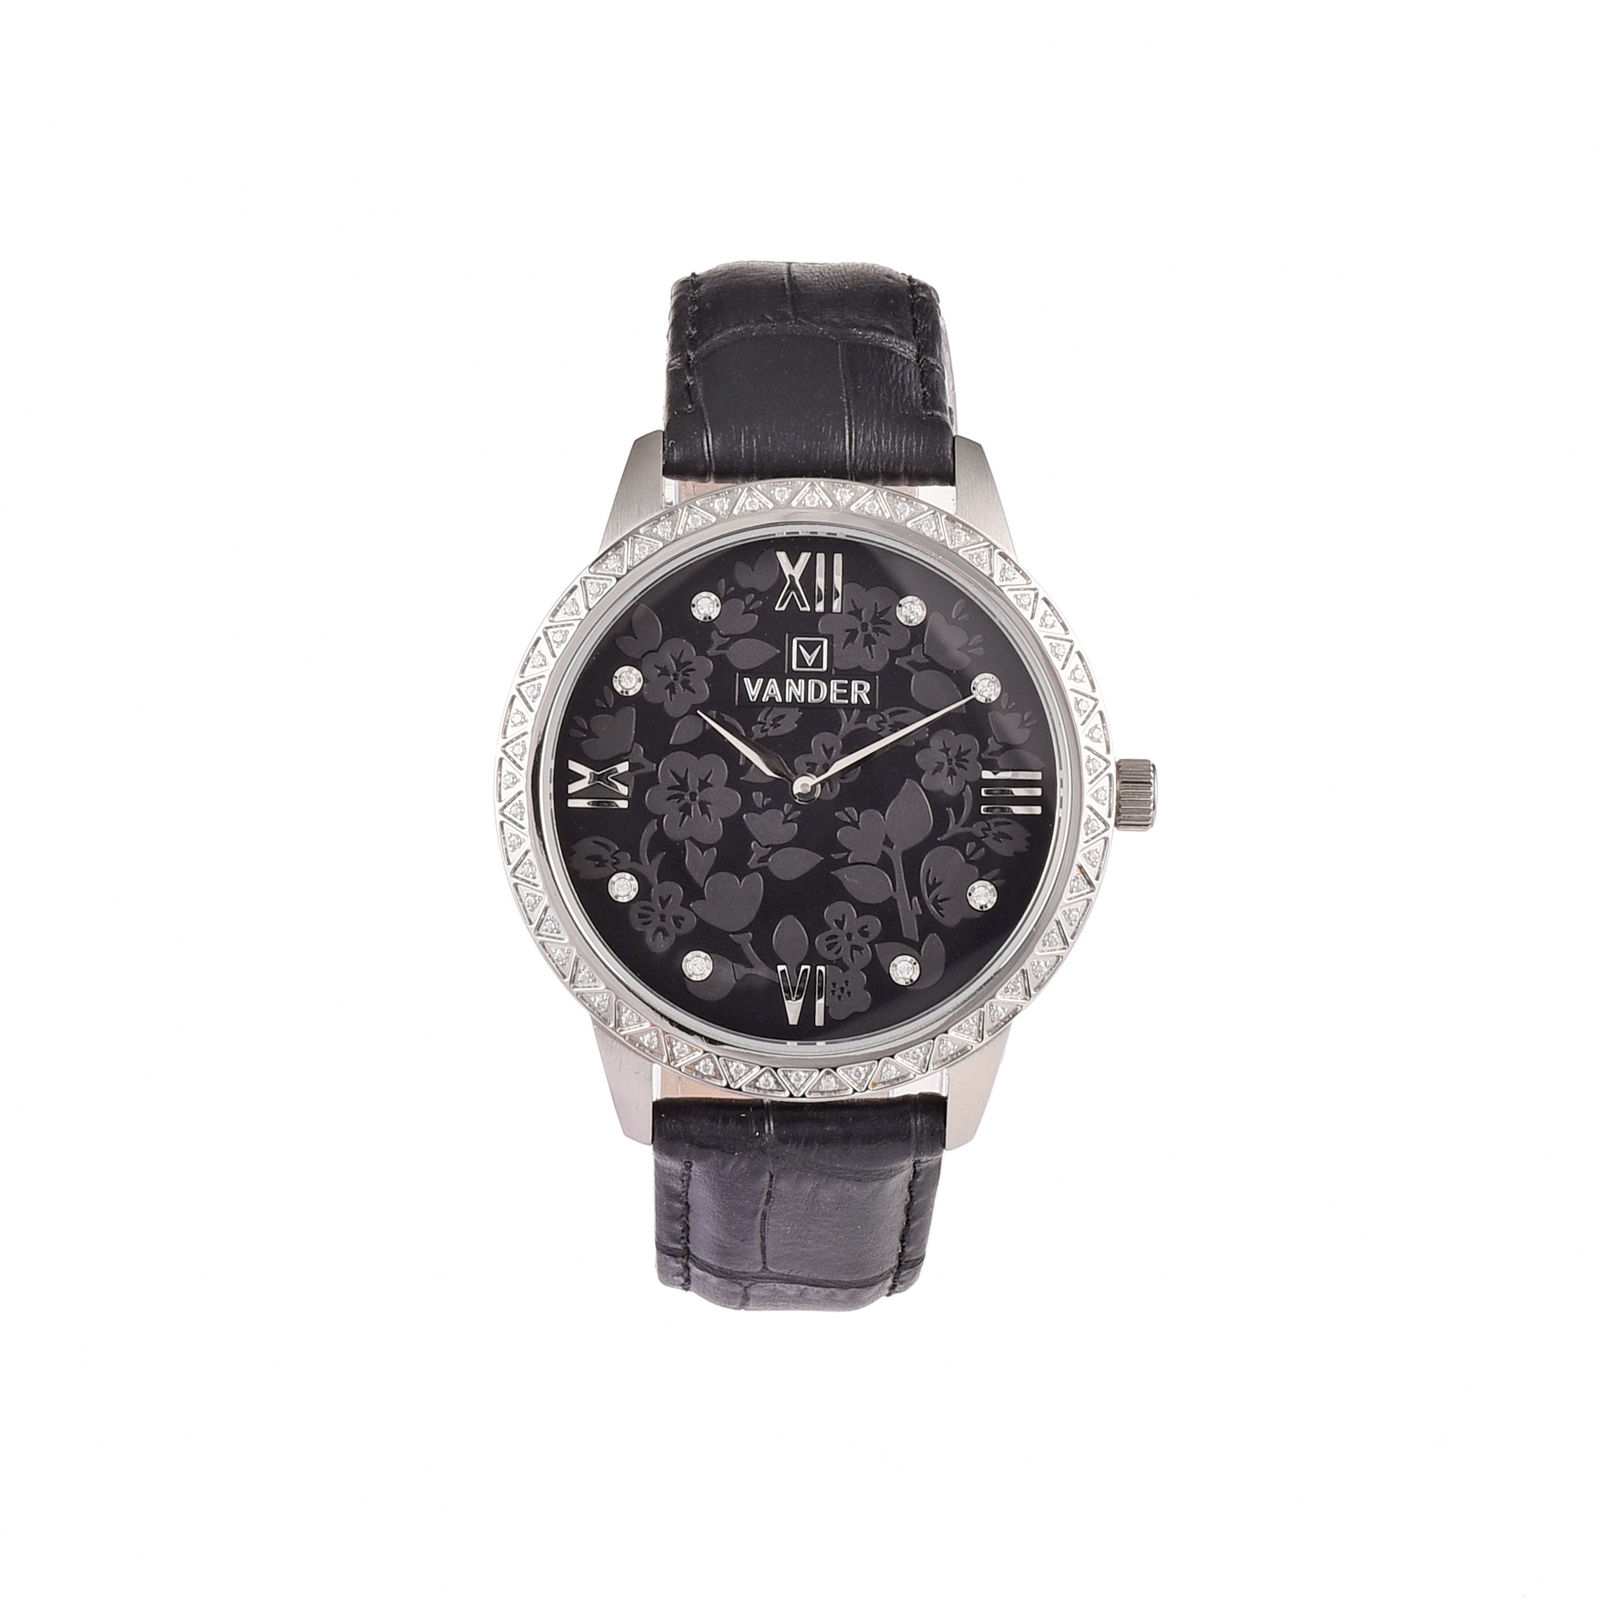 Black New Luxury Swiss RONDA Quartz Movement Man's Leisure Wrist Watch Gift For Father